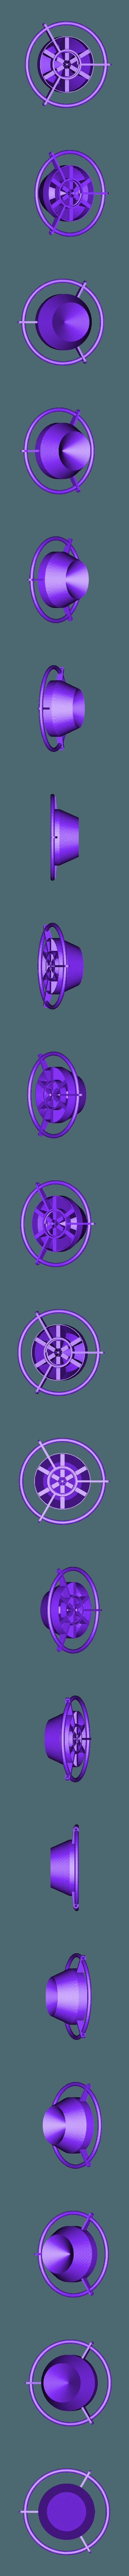 seat_2_single_2_gear.stl Download free STL file Bird Feeder • Model to 3D print, gobo38